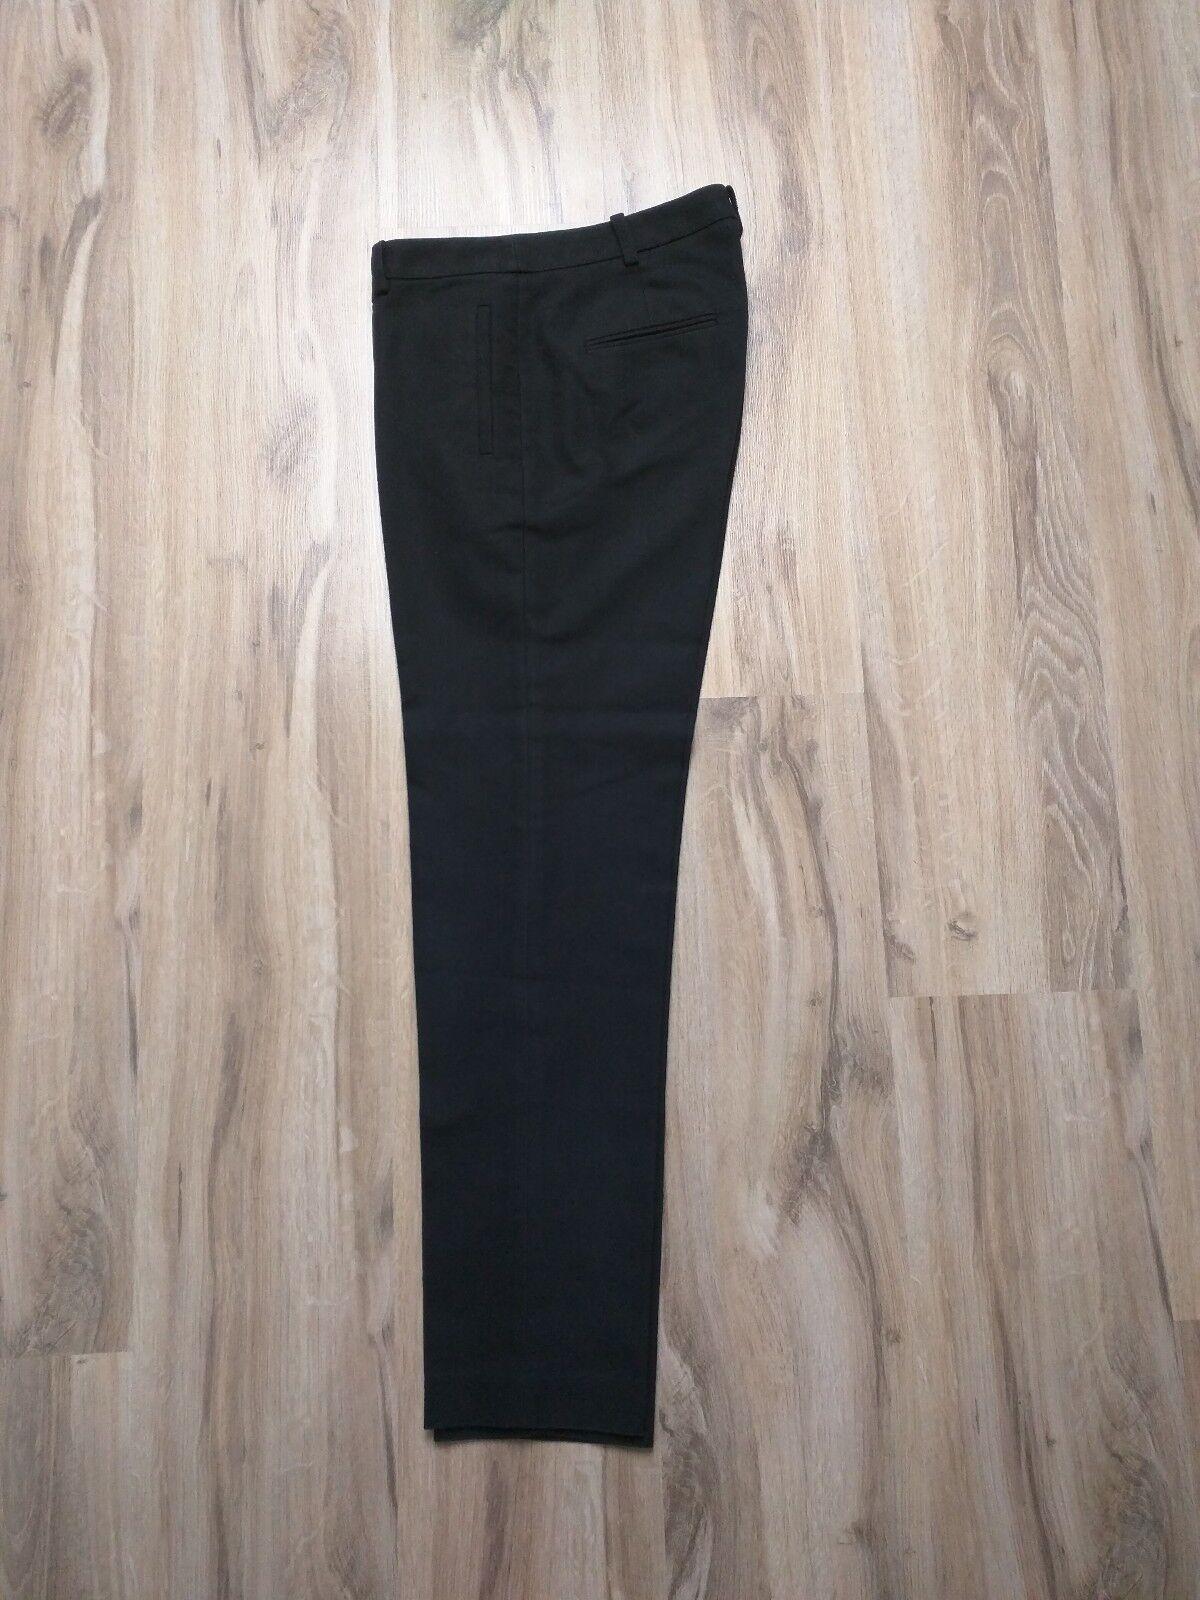 ESPRIT Damen Hose Anzug Business Büro Bundfalte 34 36 XS S TOP blau